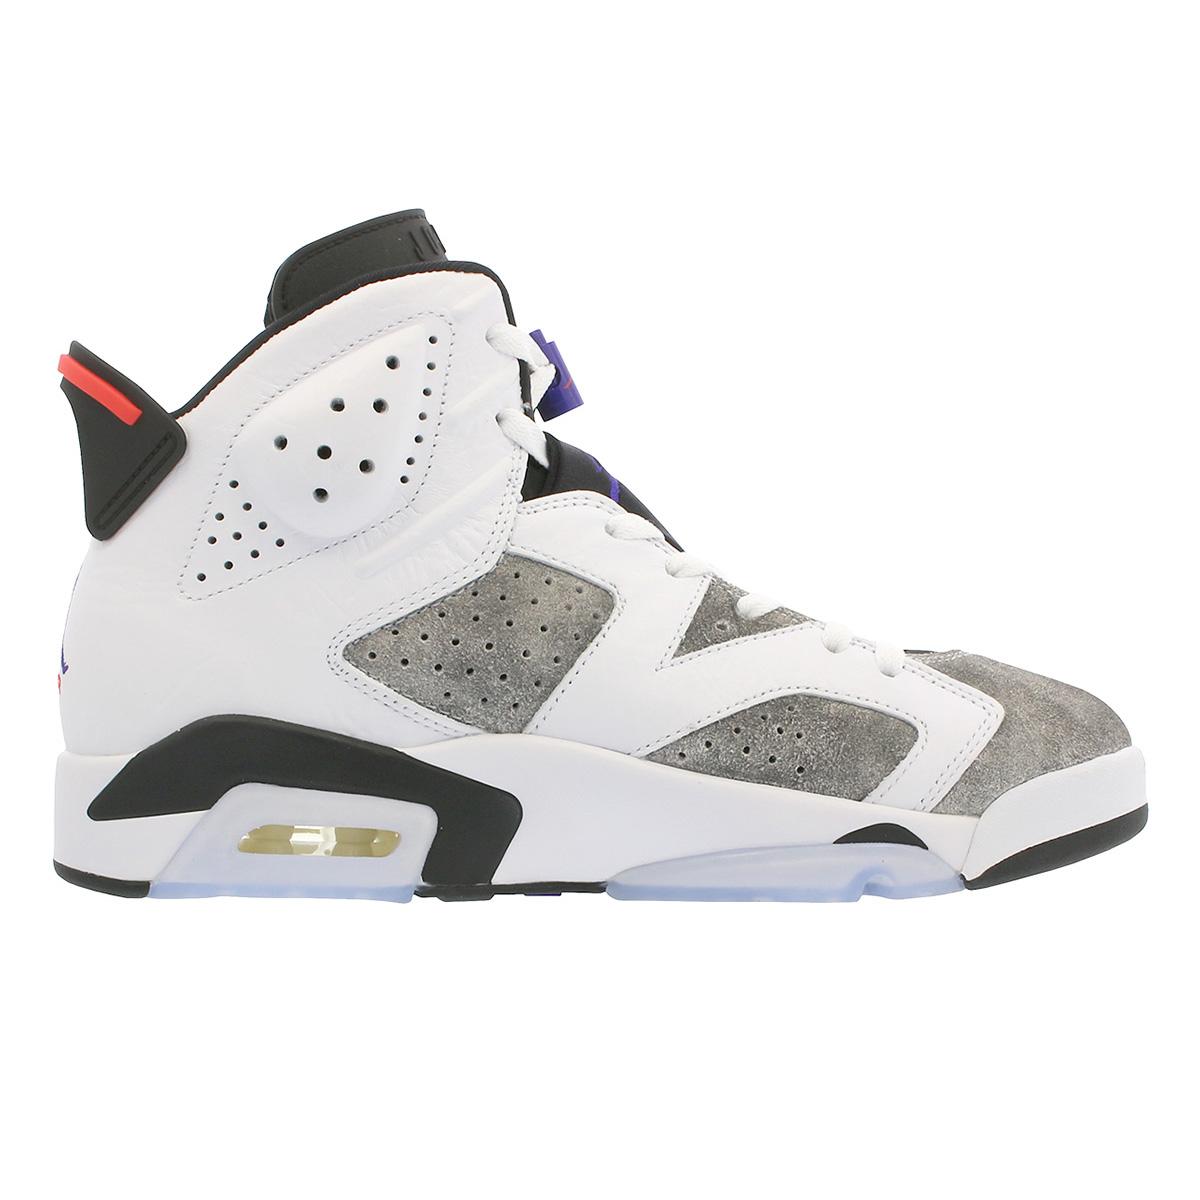 6c24b5b7c2e ... NIKE AIR JORDAN 6 RETRO Nike Air Jordan 6 nostalgic  WHITE/BLACK/INFRARED 23 ...